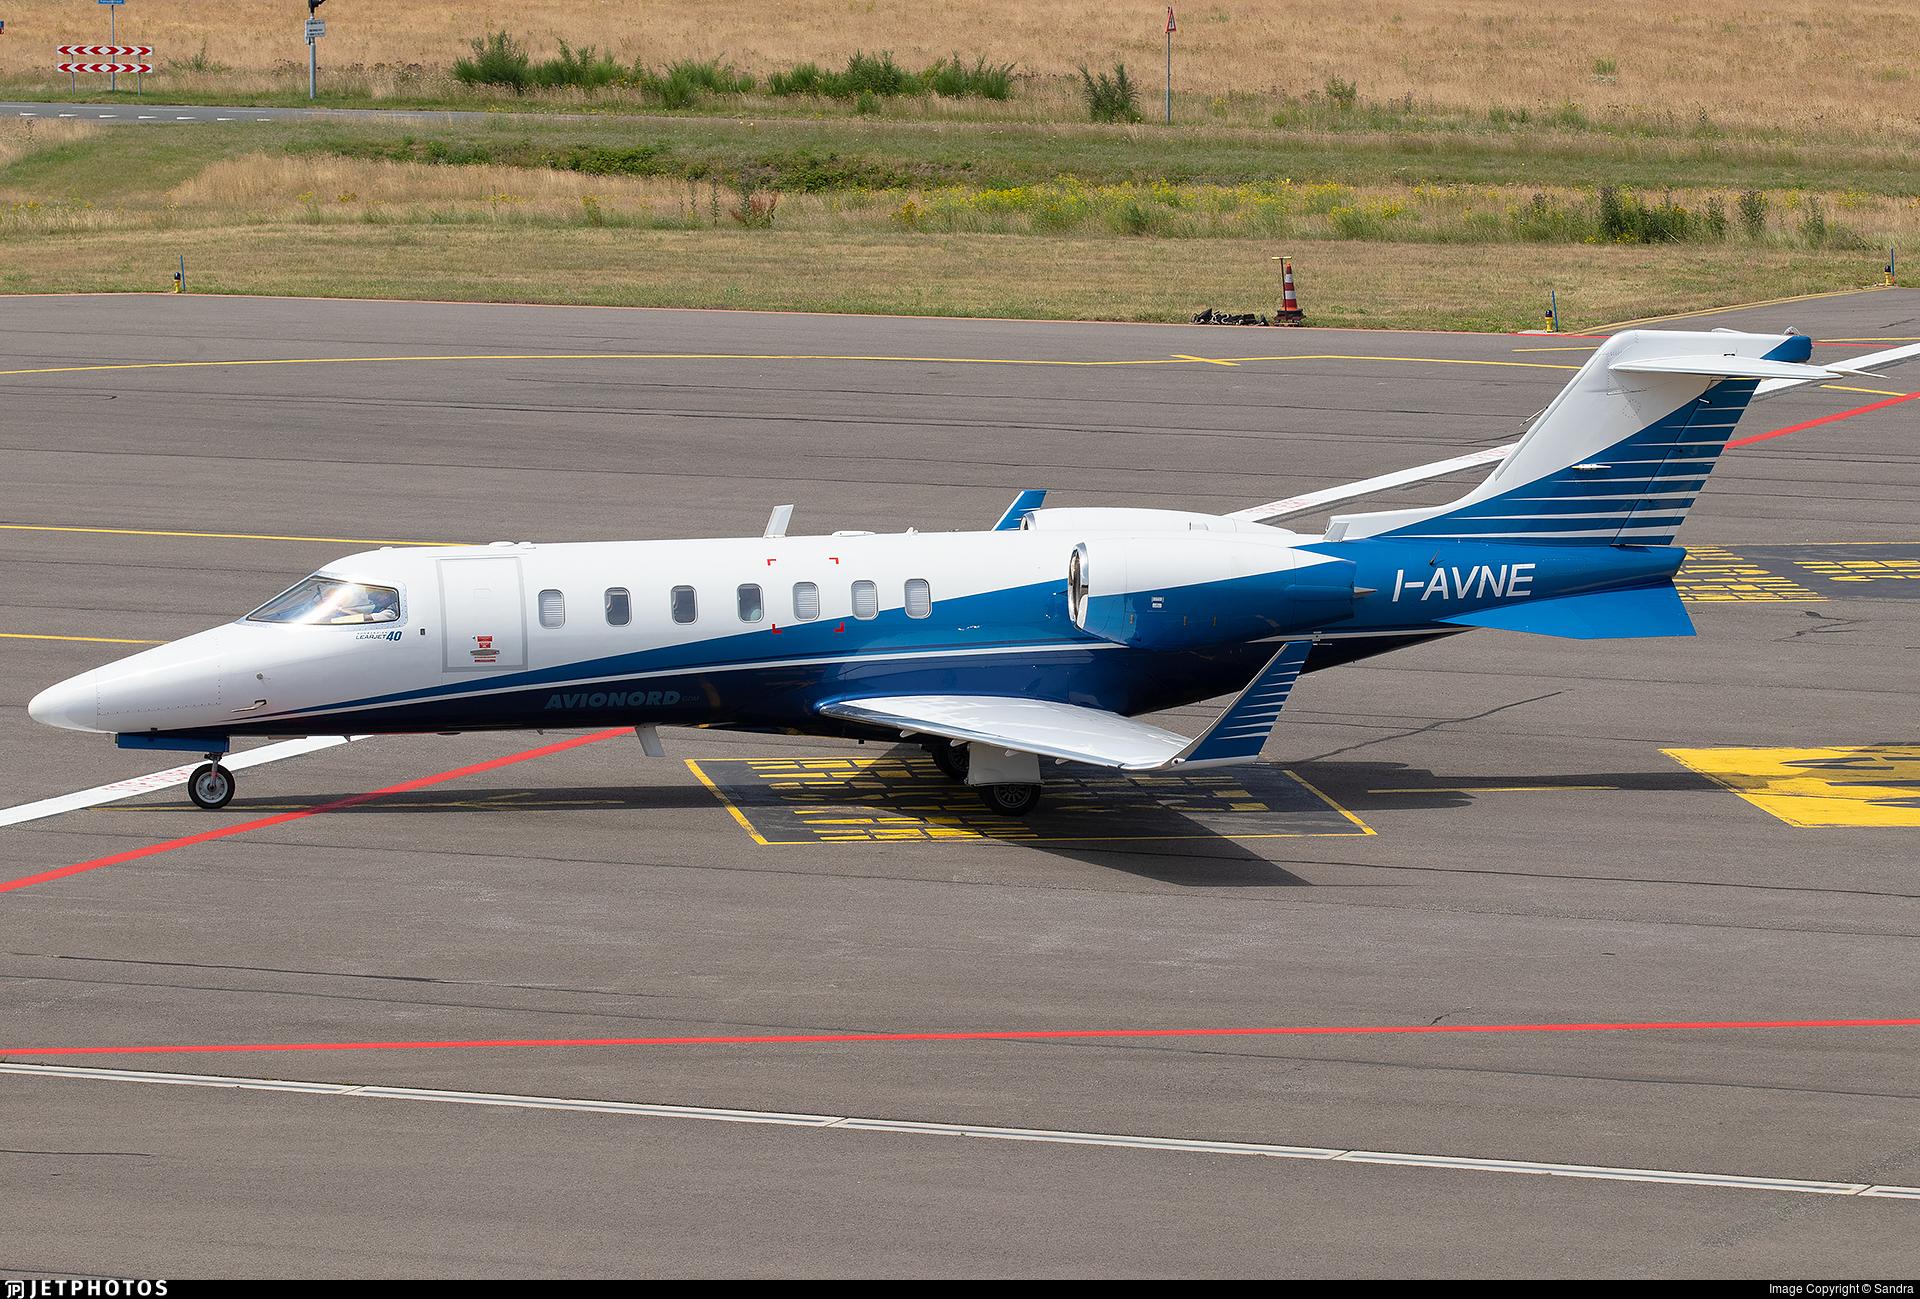 I-AVNE - Bombardier Learjet 40 - Avionord